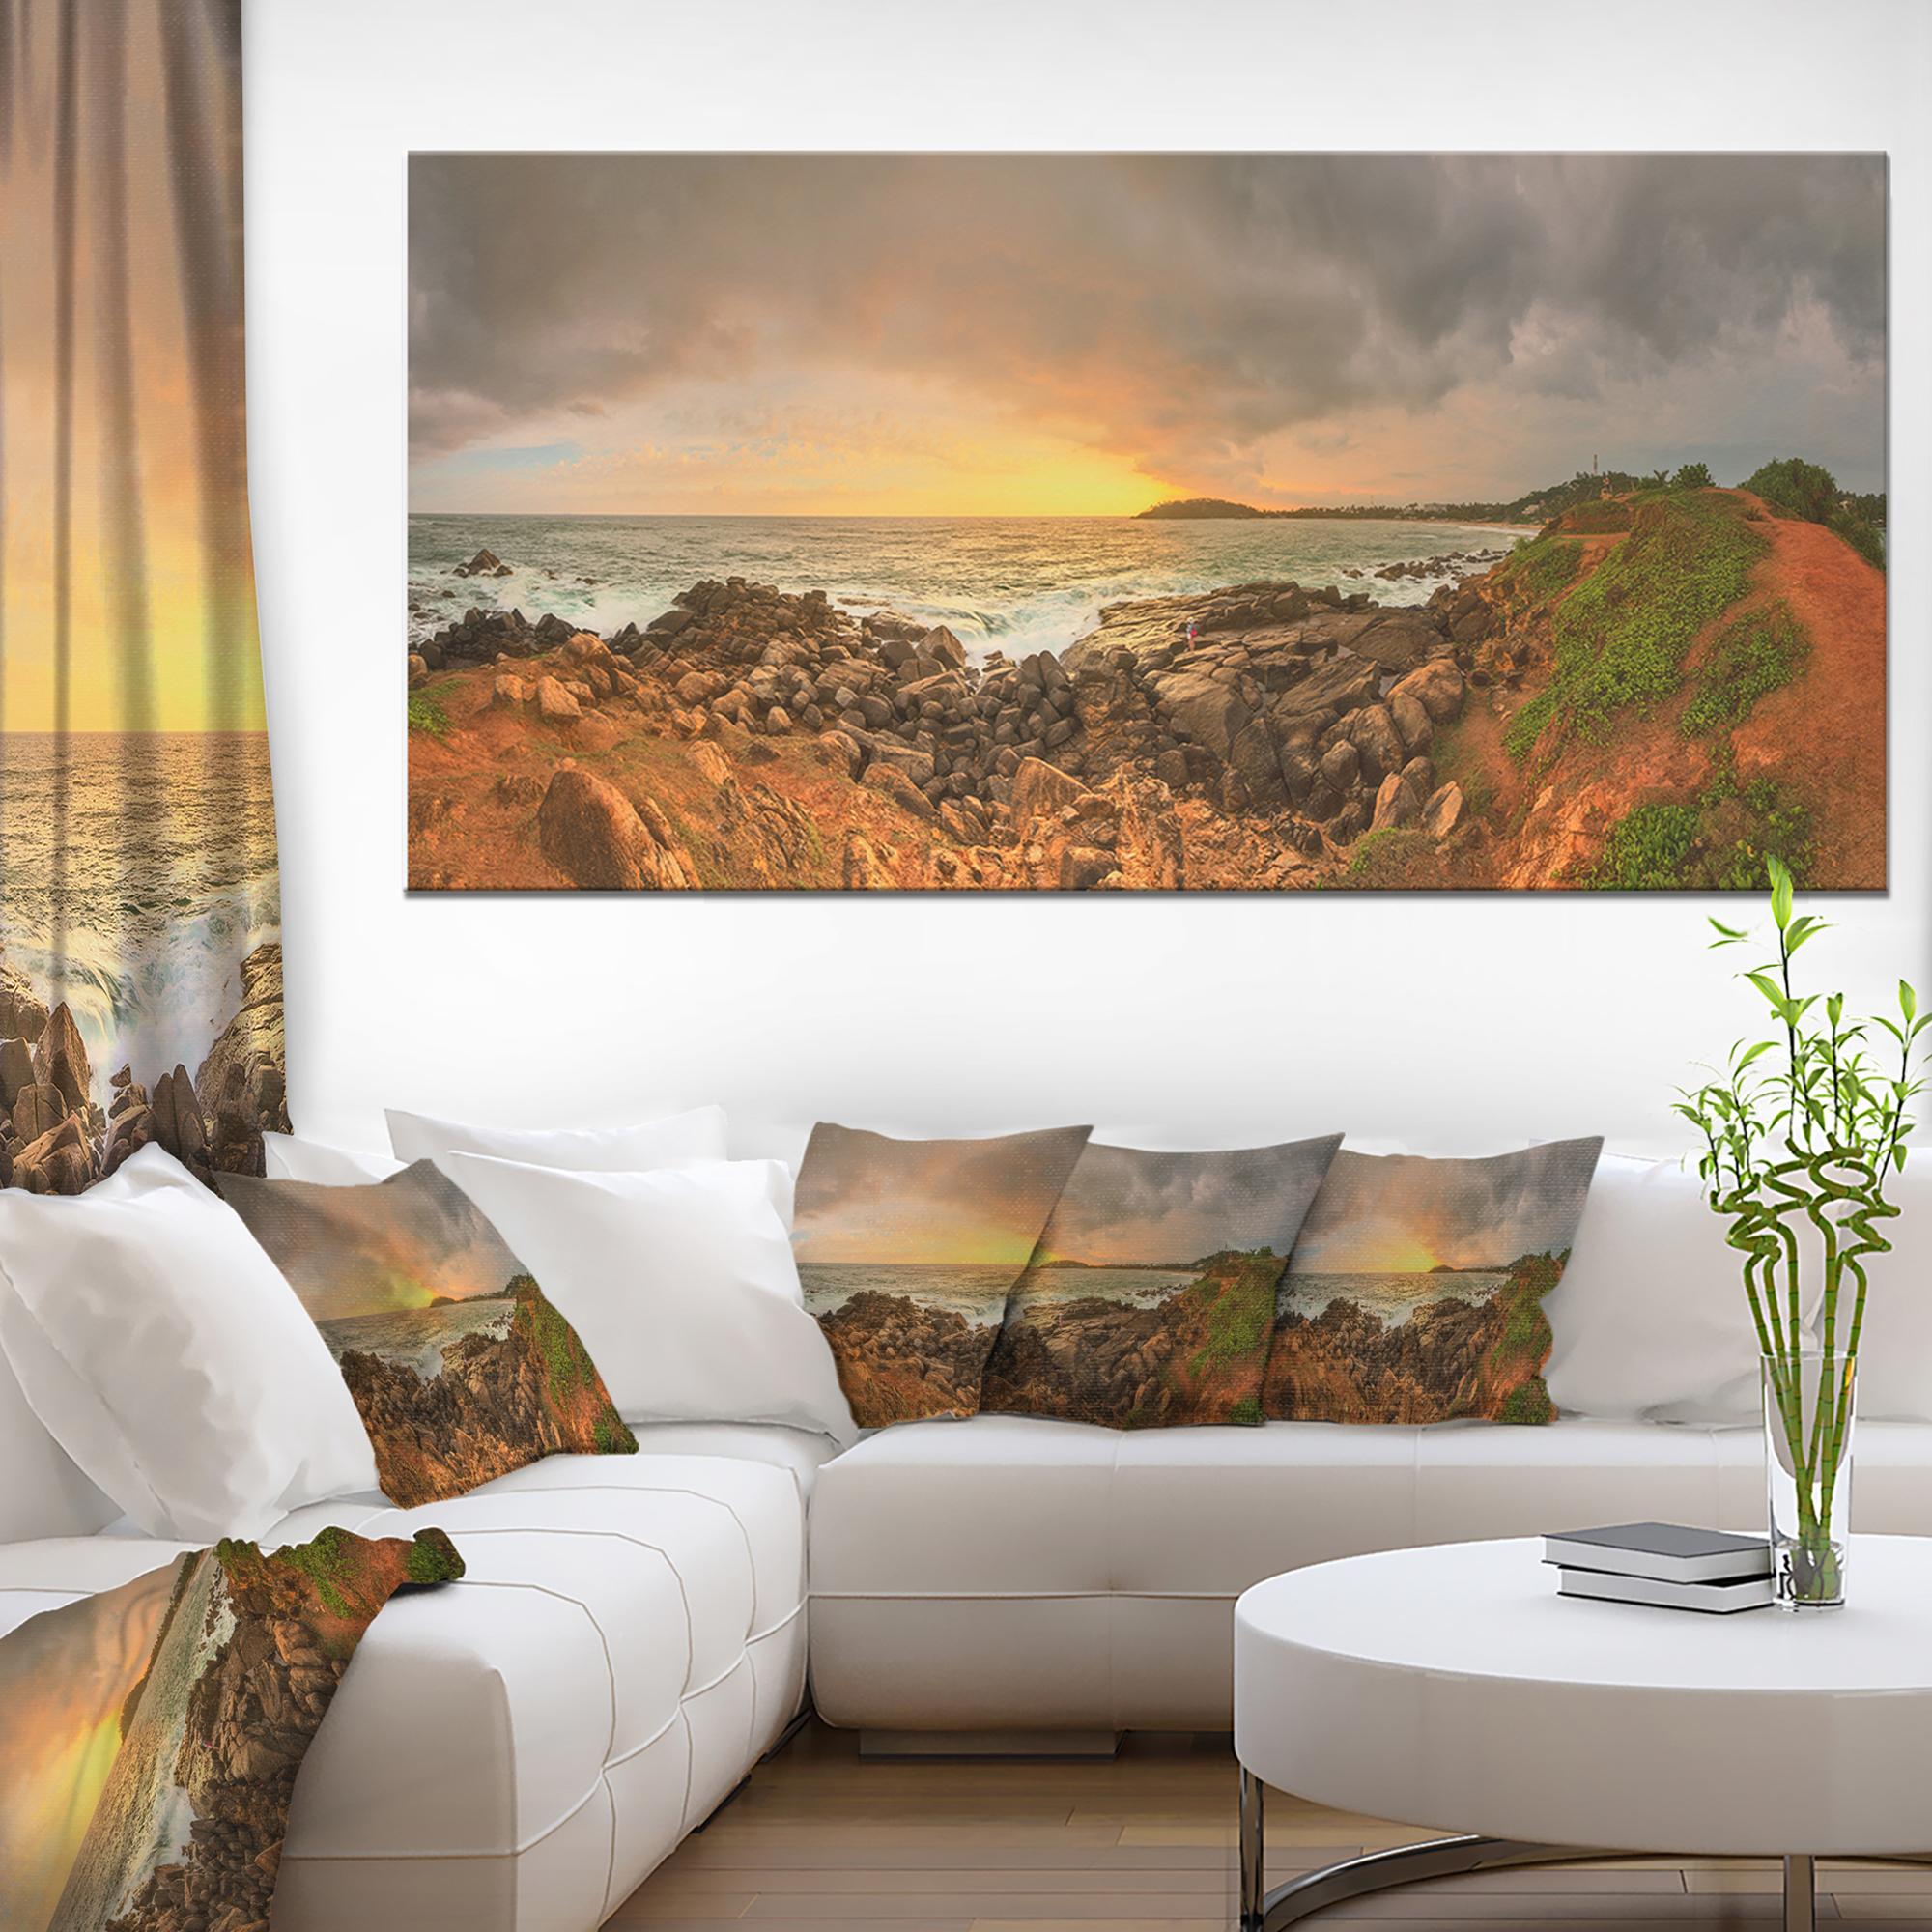 Sunrise at Romantic Beach at Sri Lanka - Landscape Artwork Canvas - image 1 of 3